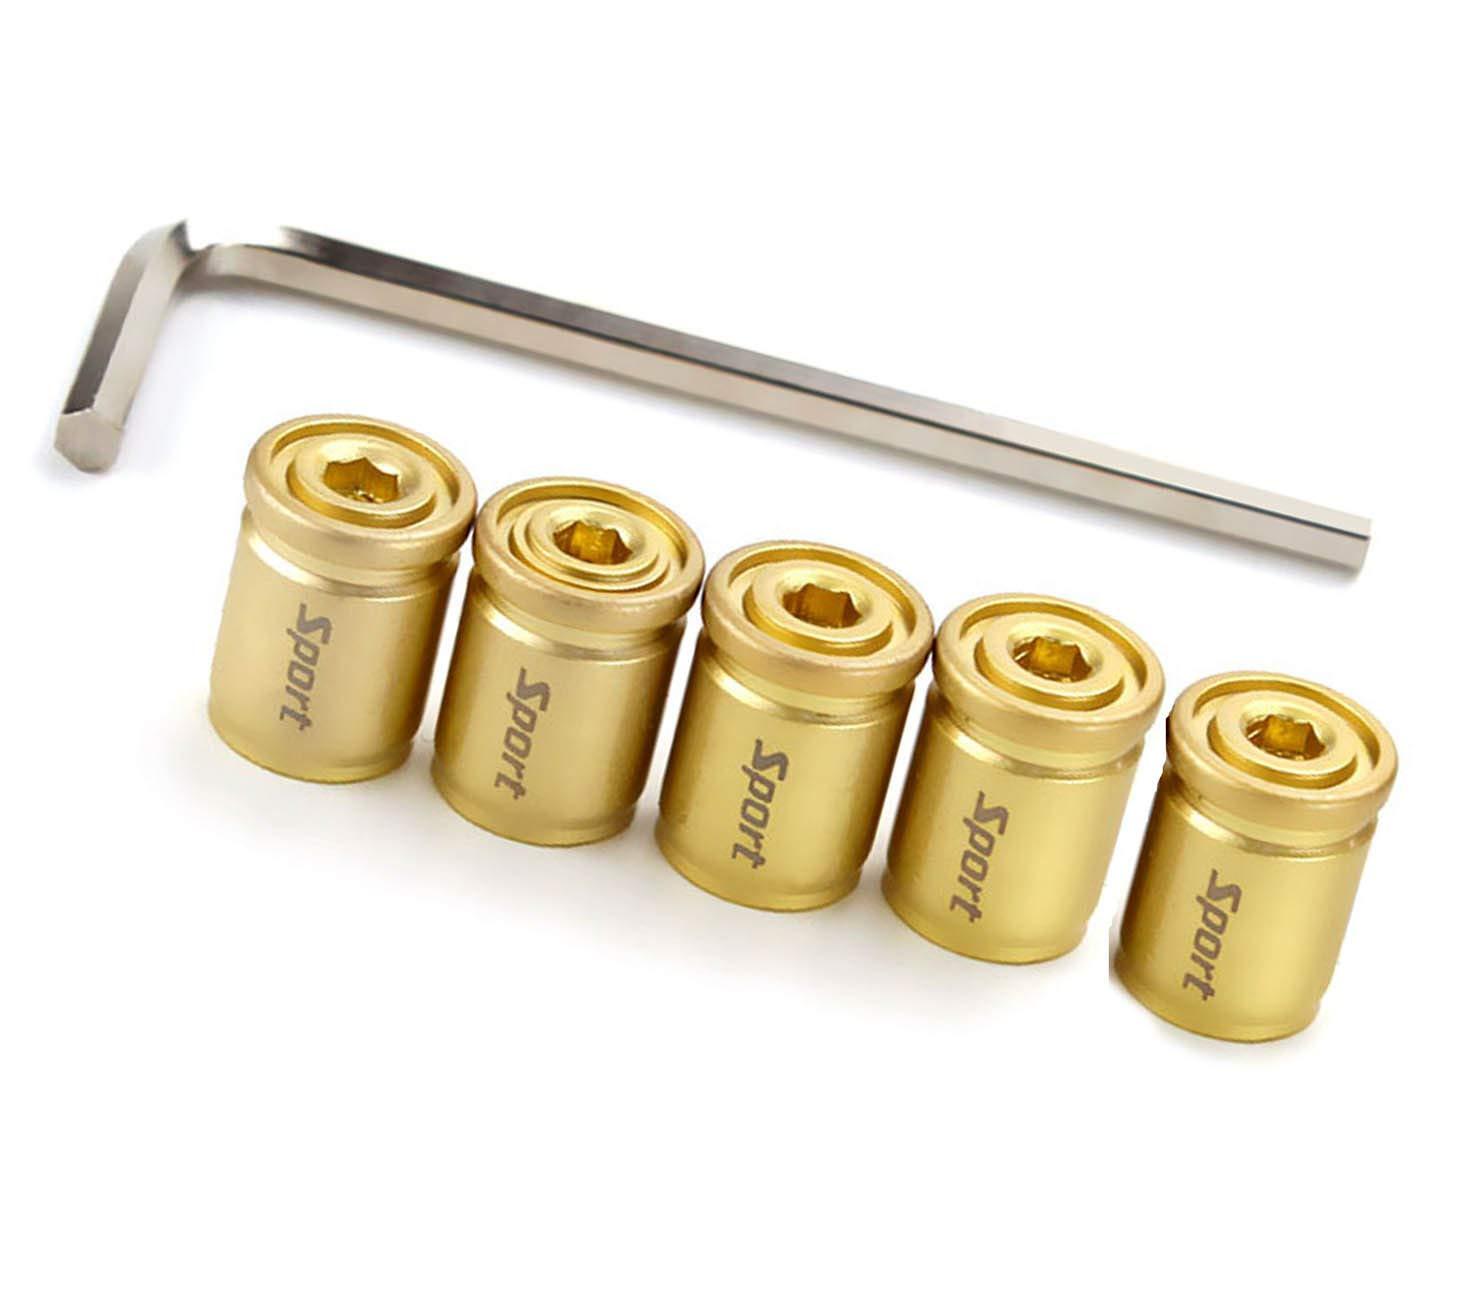 Coche Neum/ático Tapa de v/ástago de v/álvula C/áscara de bala Anti-robo (5 piezas)